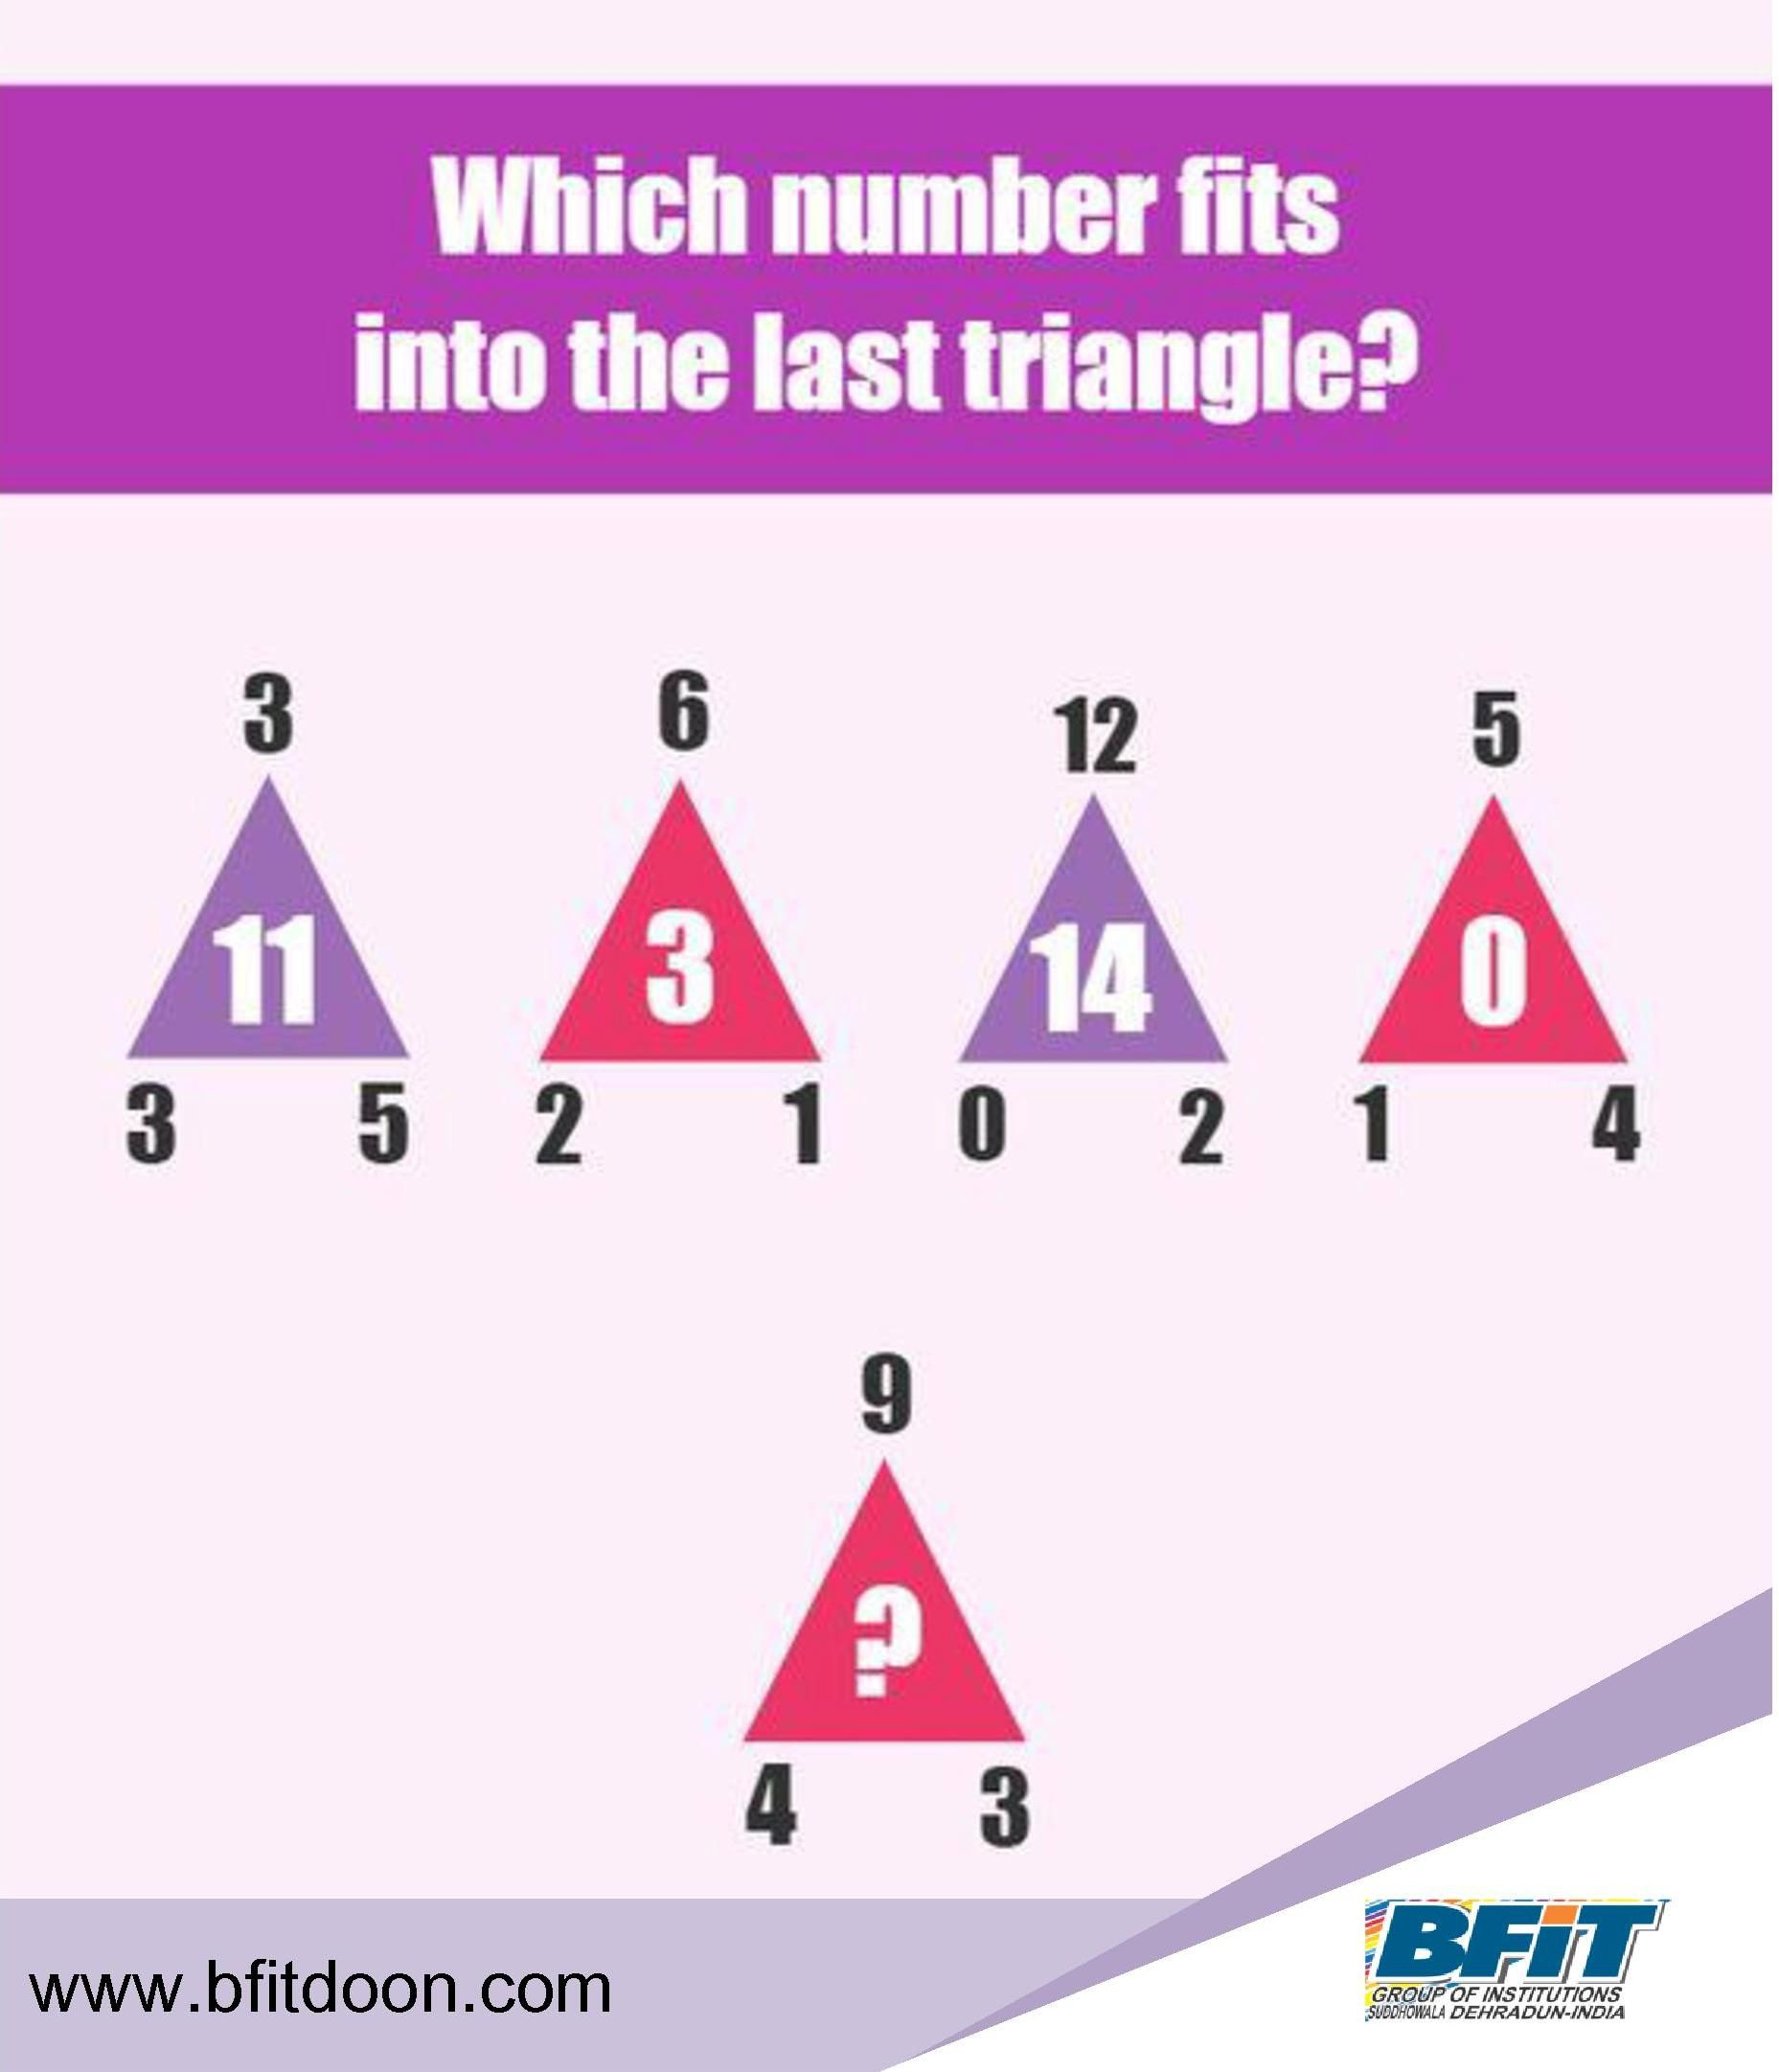 Riddle MathPuzzle BrainTeaser IQTest BFIT Dehradun